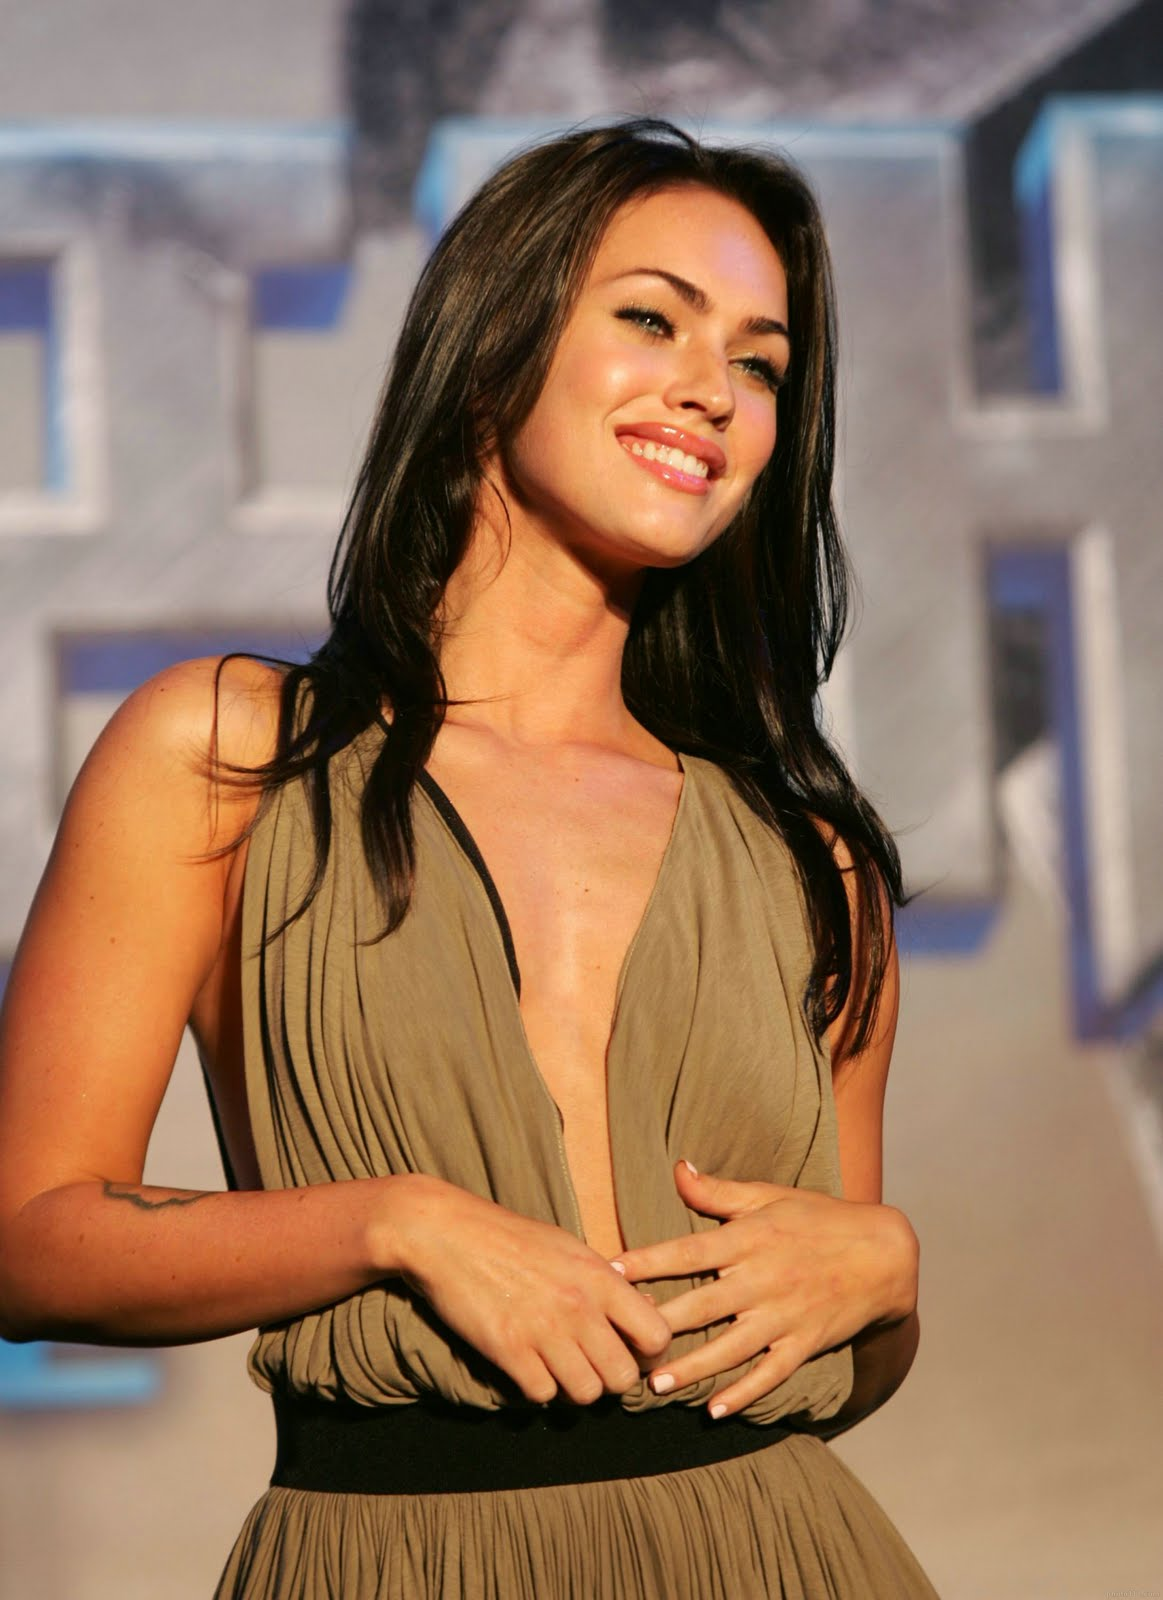 Hd Girl Highlights Wallpaper Hot Actress Megan Fox Girls Idols Wallpapers And Biography